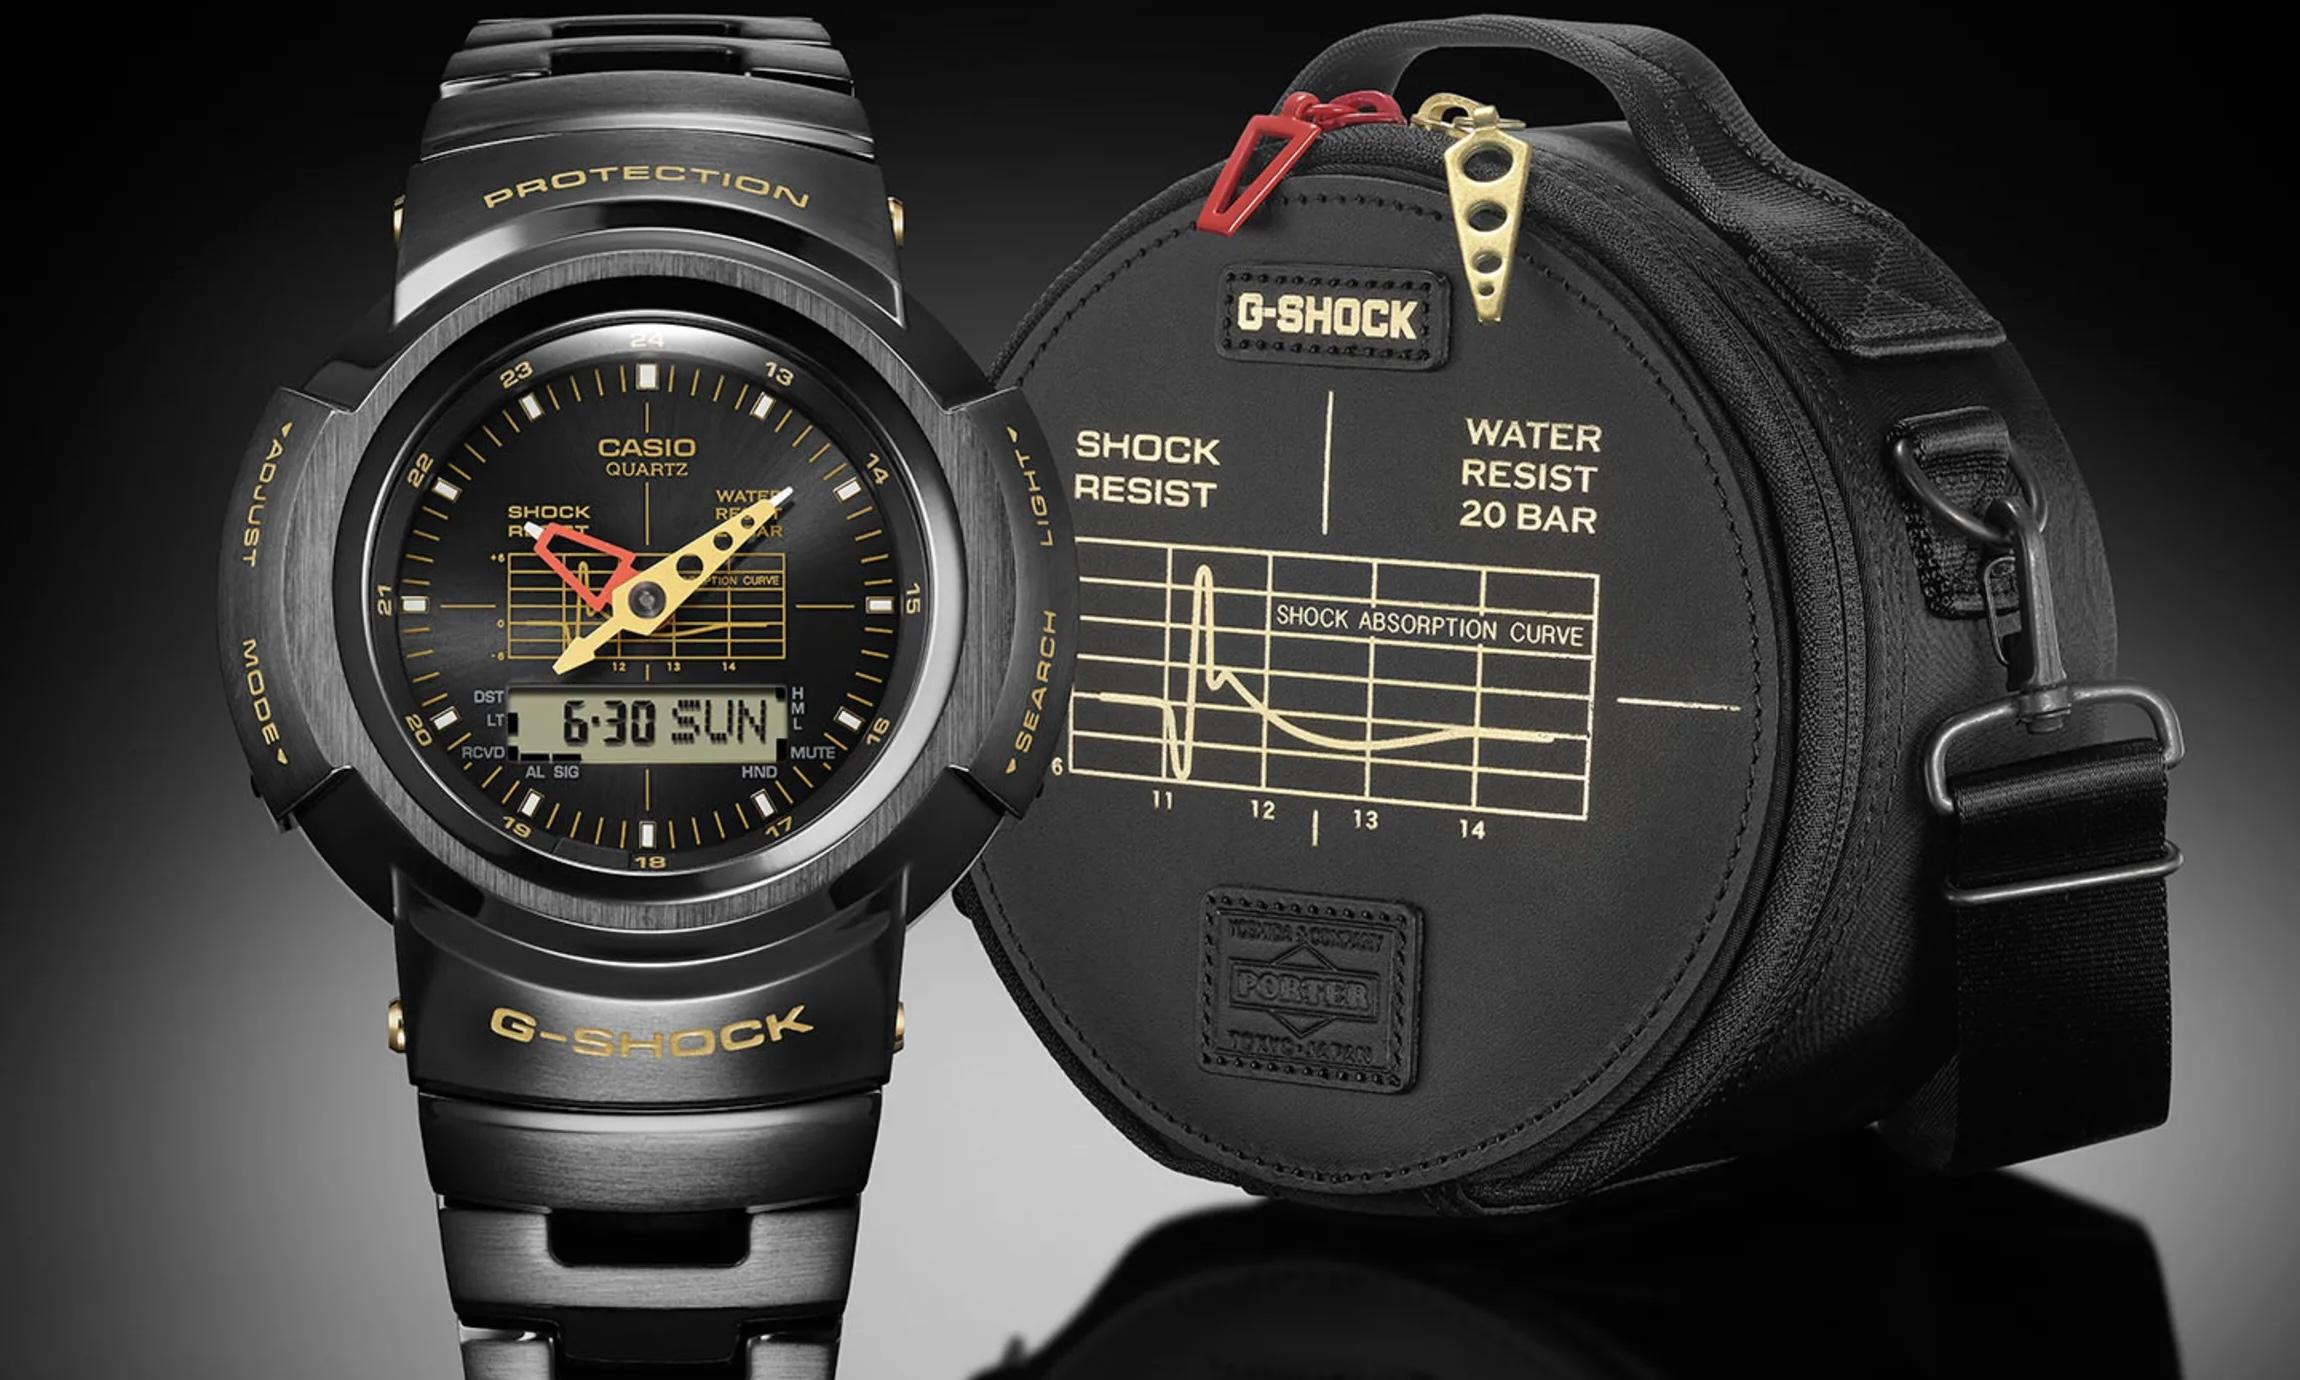 PORTER 与 G-SHOCK 合作推出限量版腕表